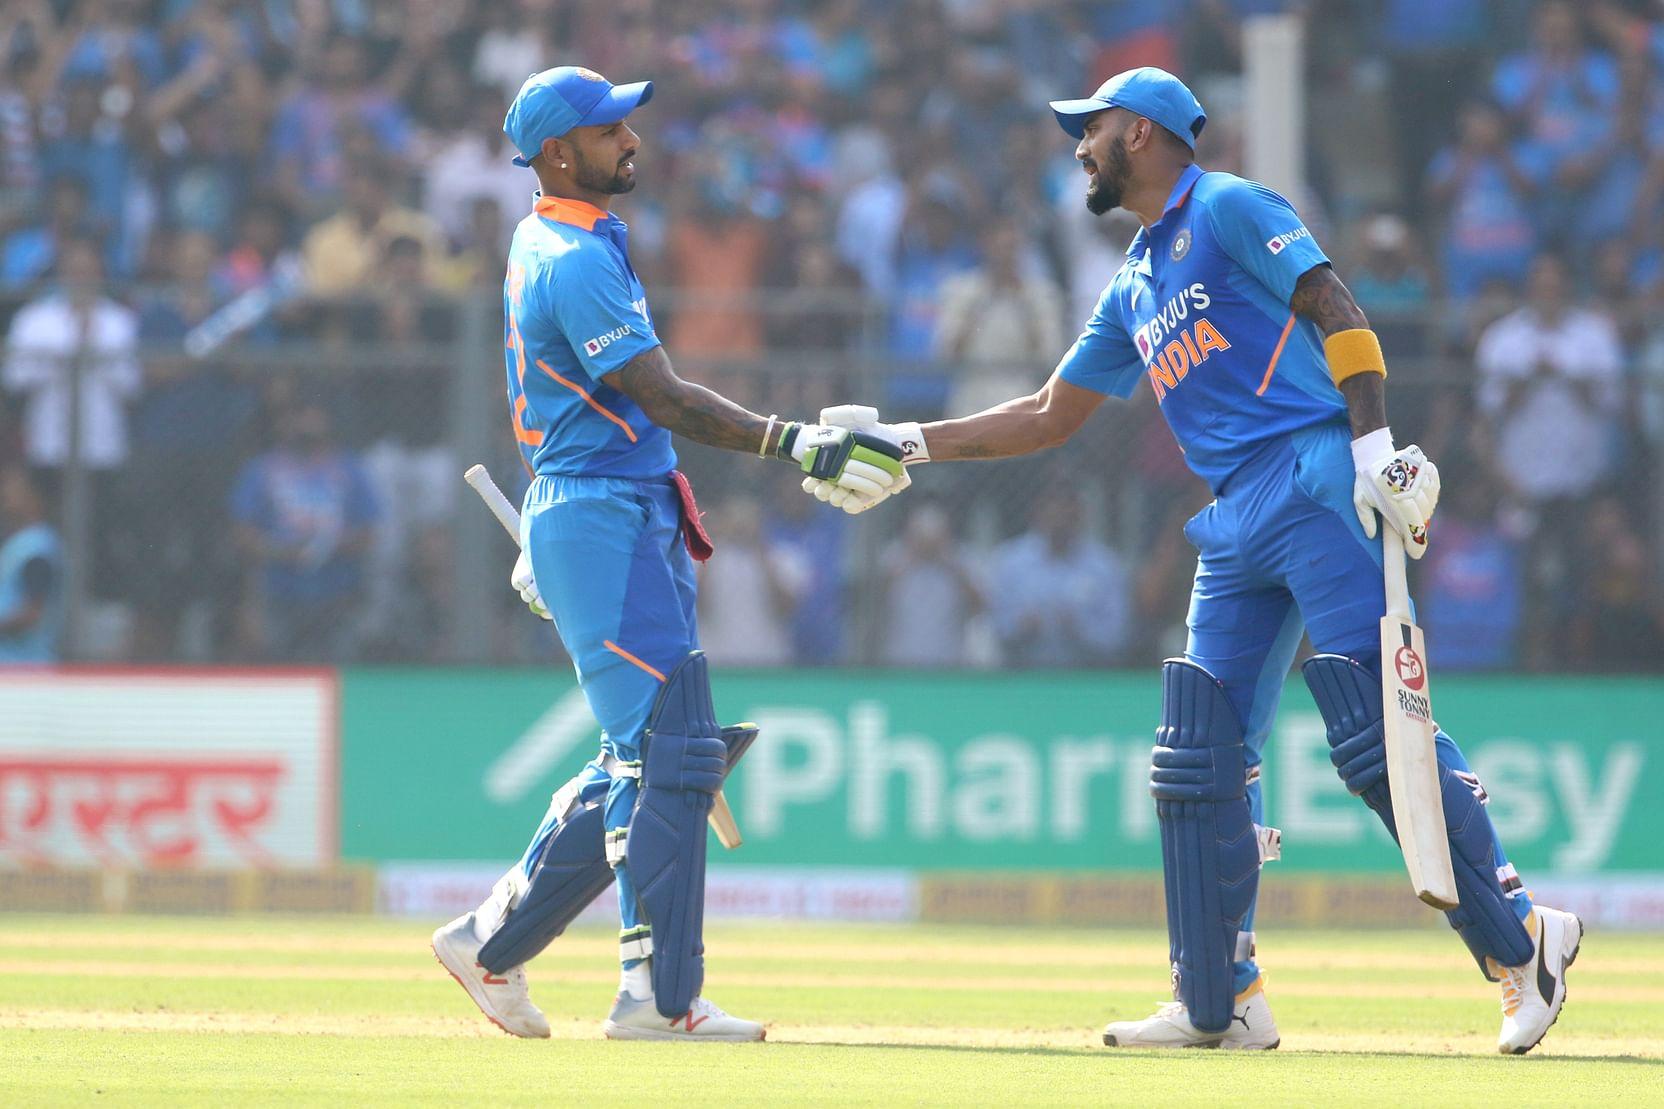 dhawan-kl-rahul-vs-australia-1st-odi-2020